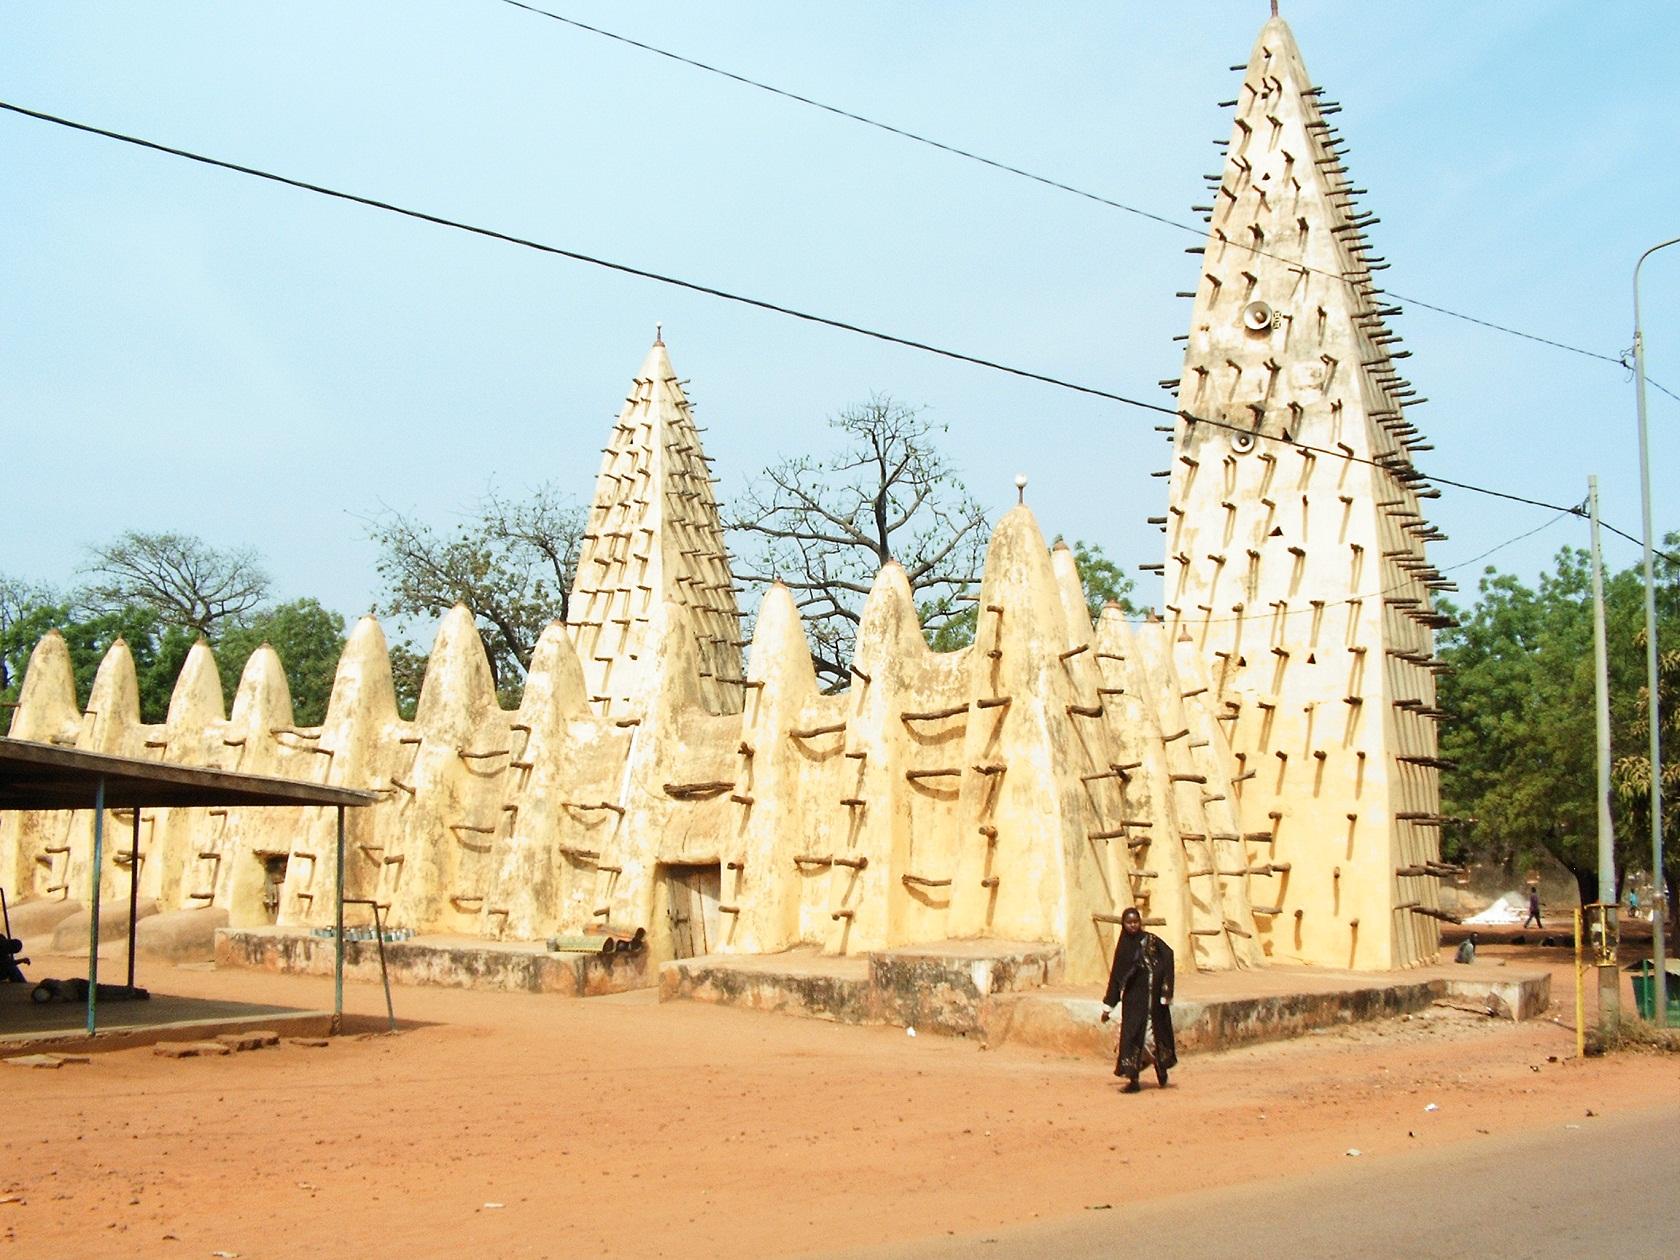 Mezquita de burkinafaso